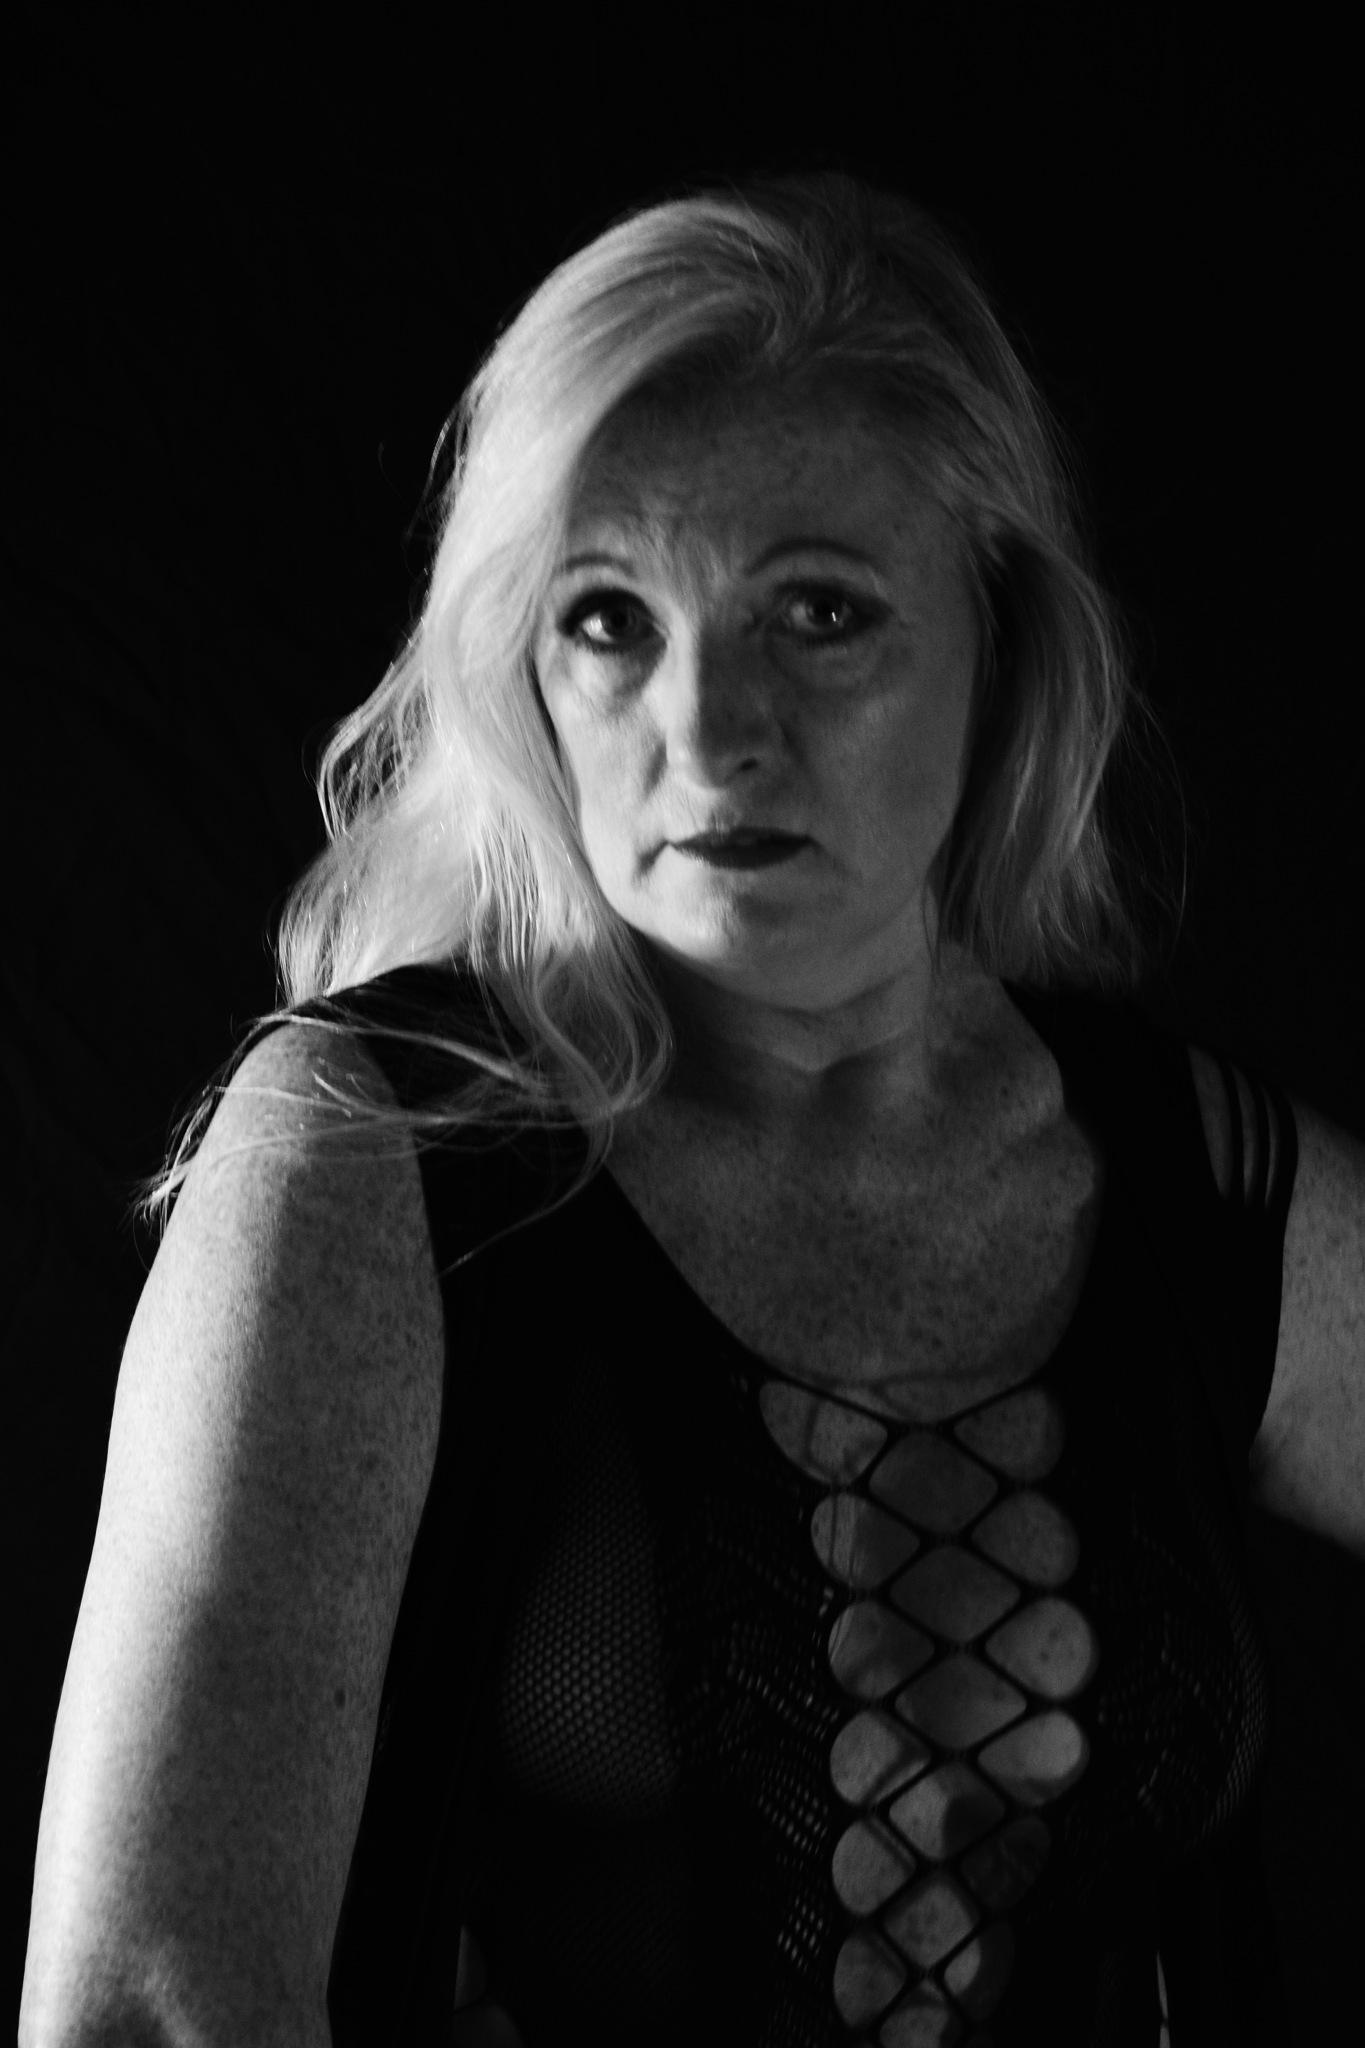 Mrs J Series by Hobbytog59